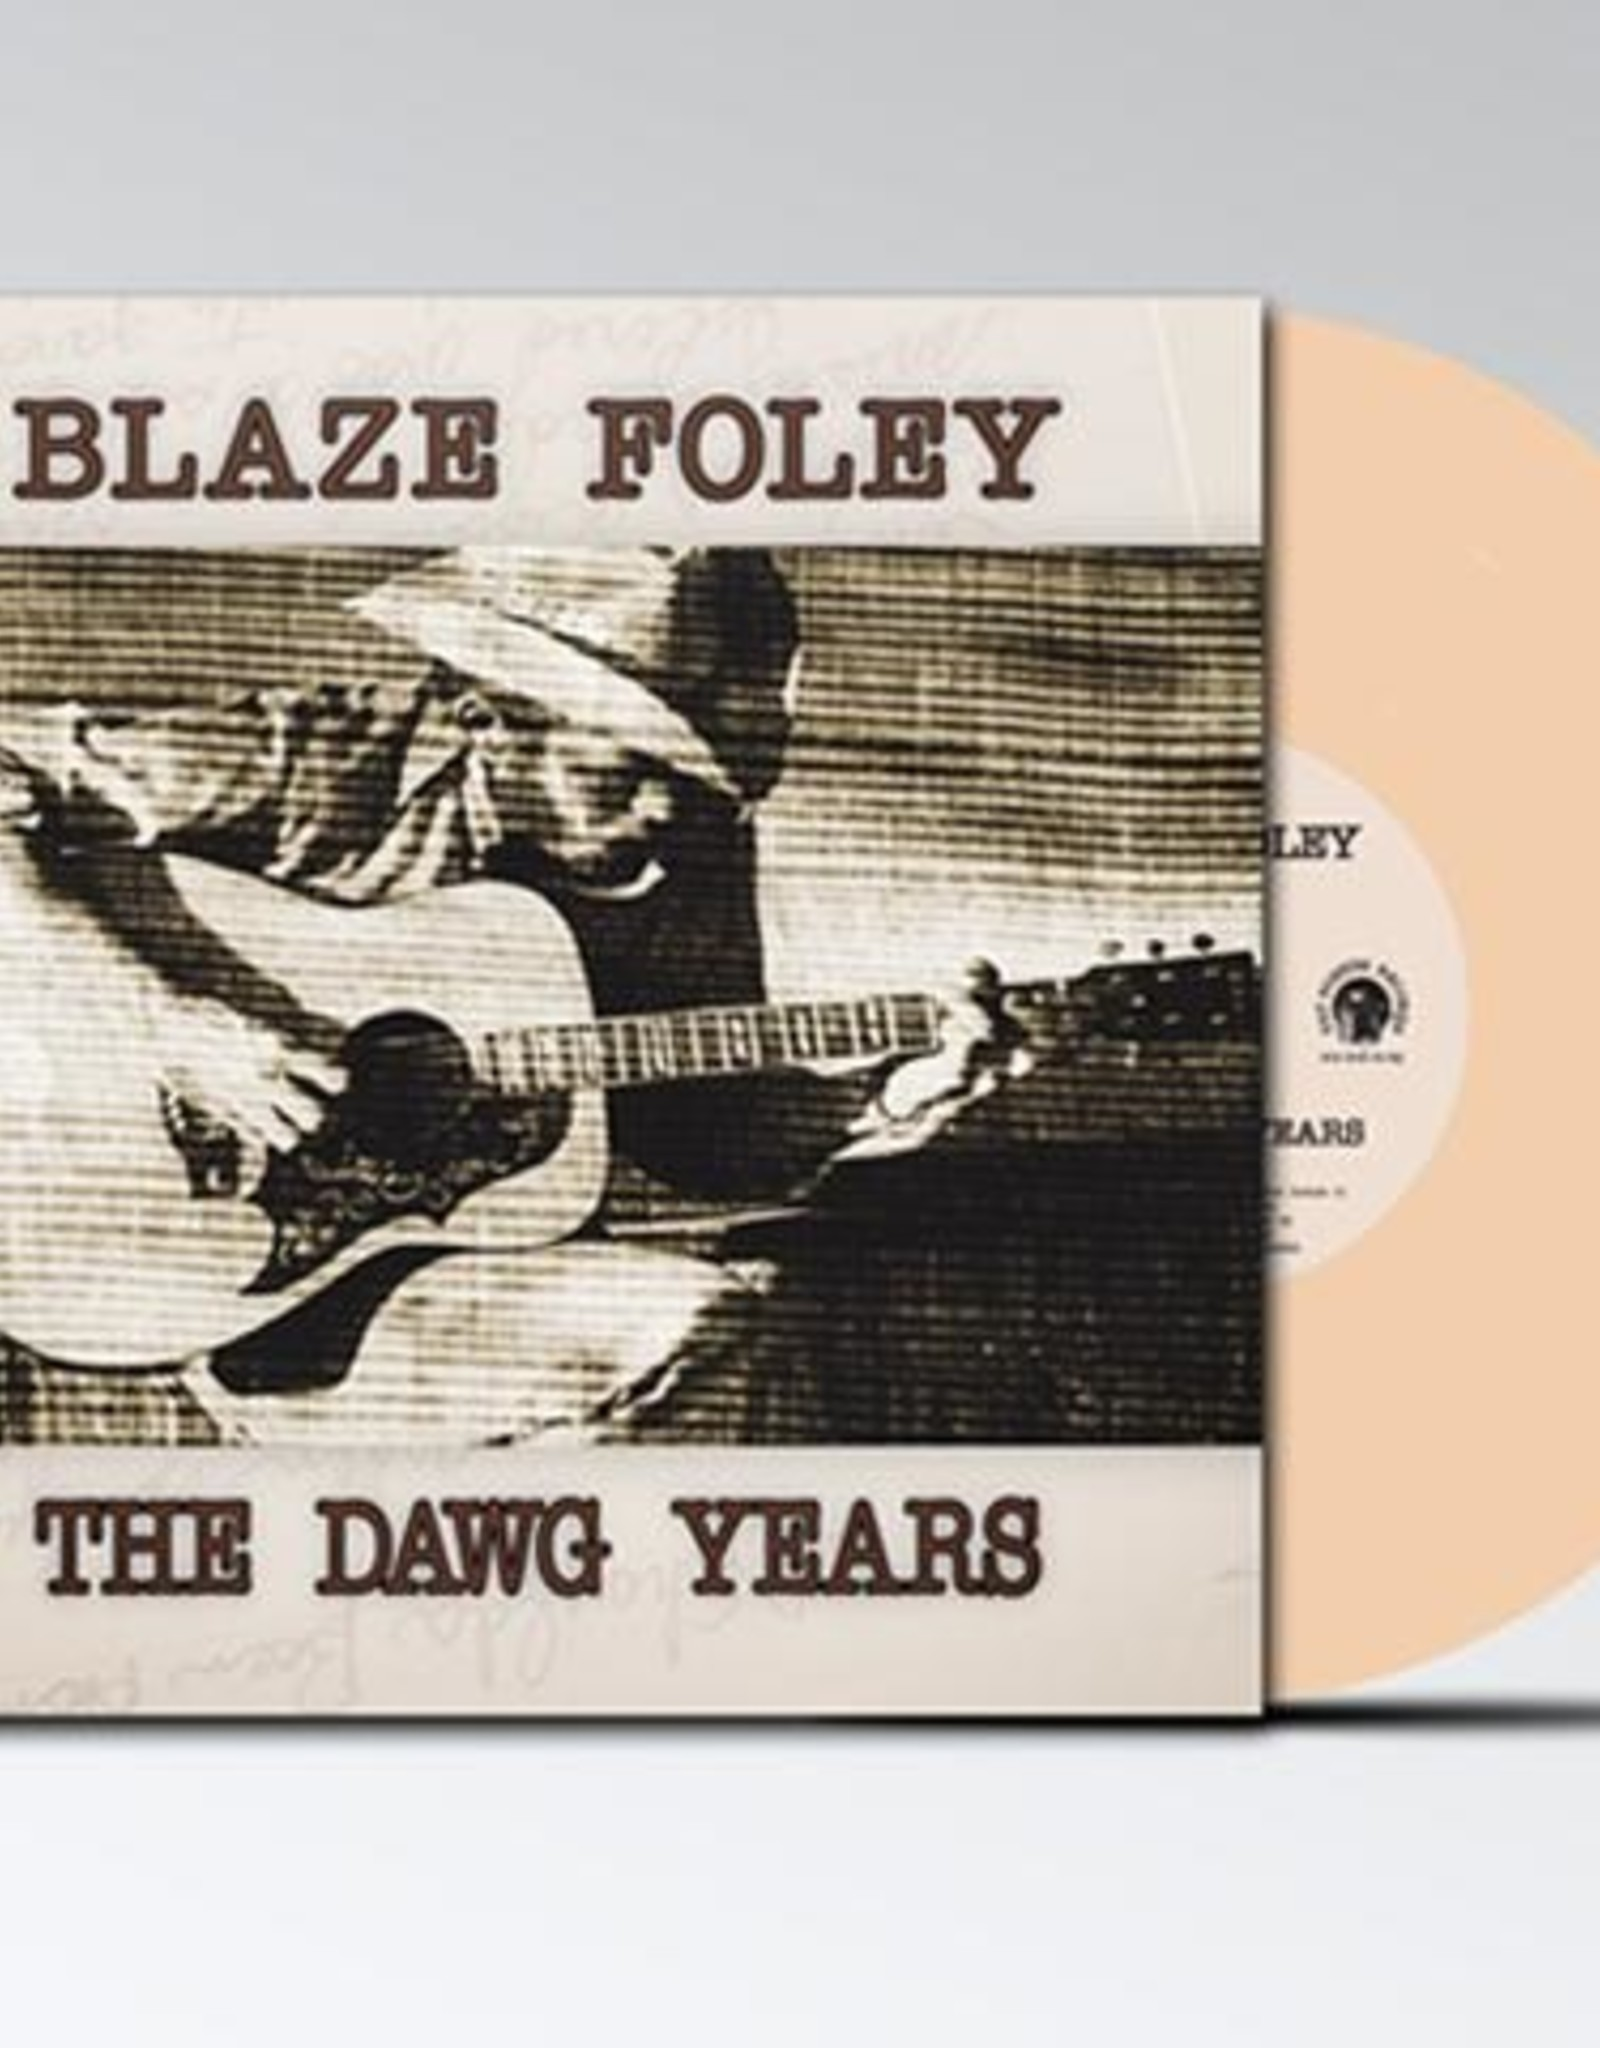 Blaze Foley - The Dawg Years (Cream Vinyl)